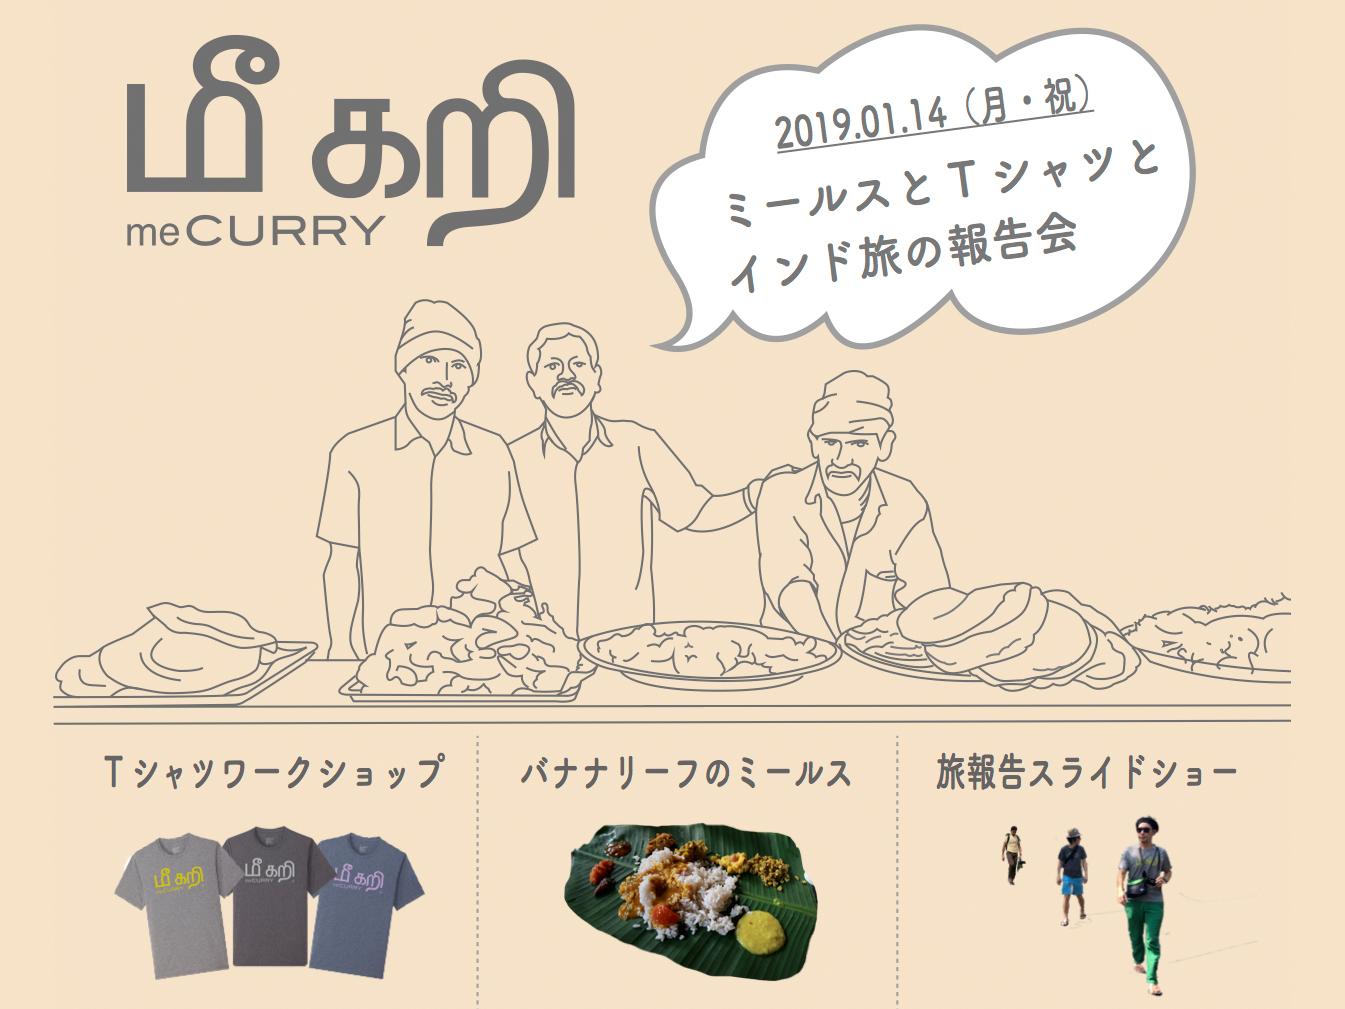 MeCURRY ミールスとTシャツとインド旅の報告会